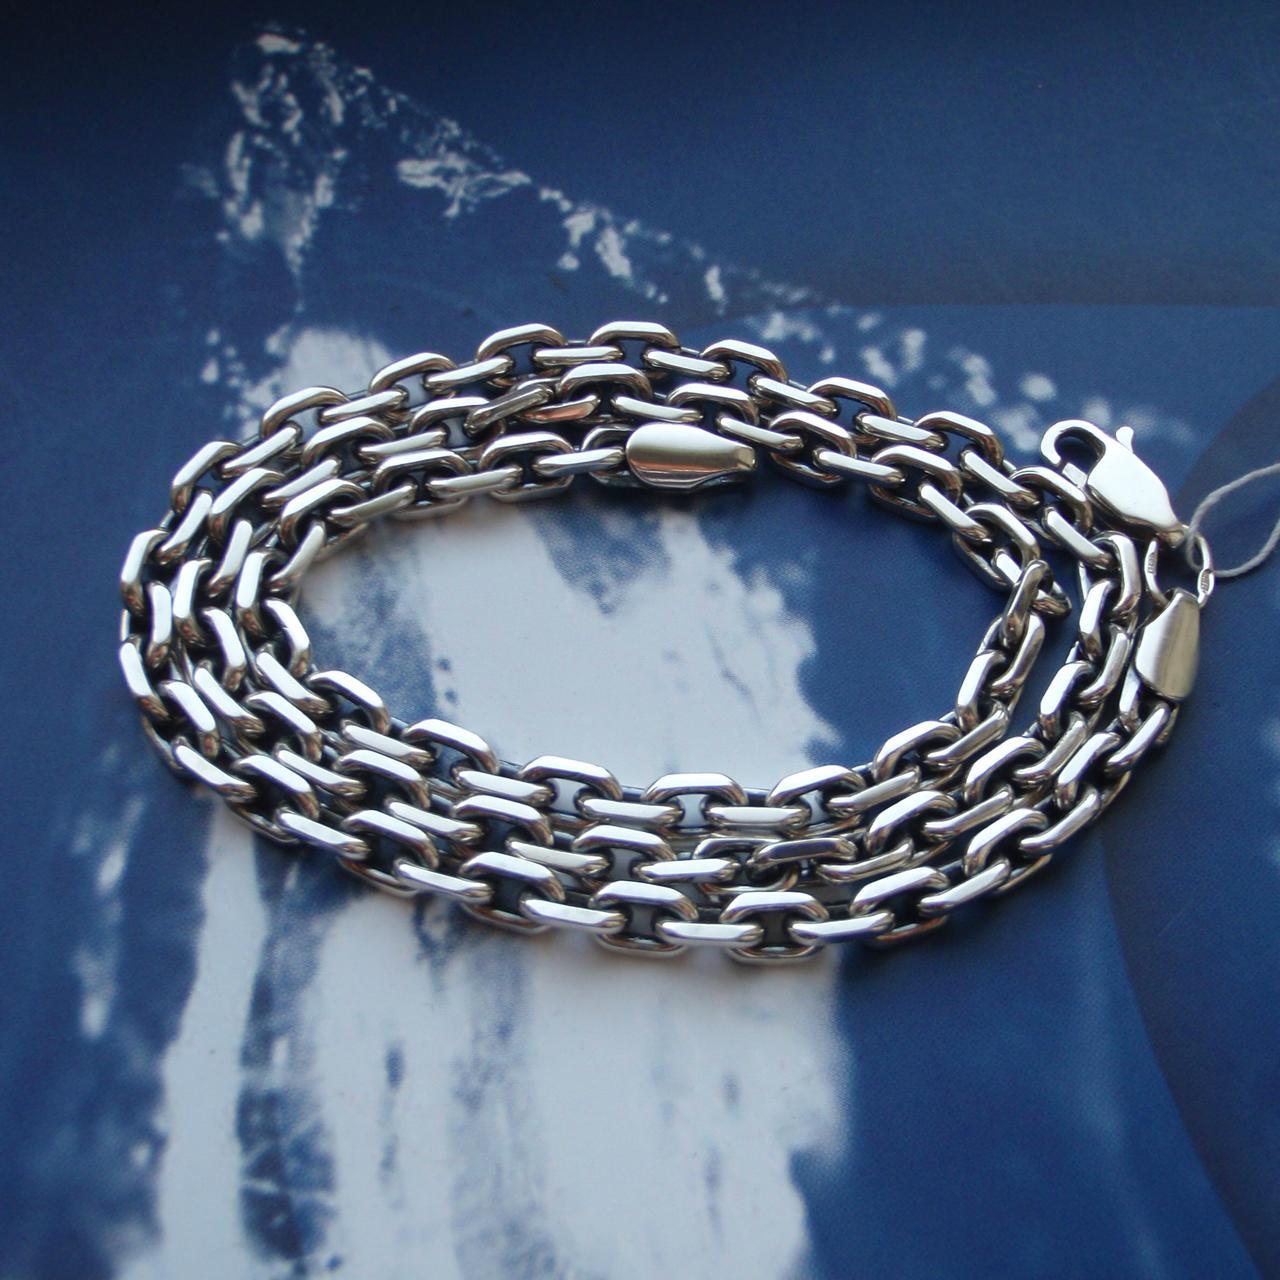 Серебряная цепочка, 600мм, 41 грамм, якорное плетение